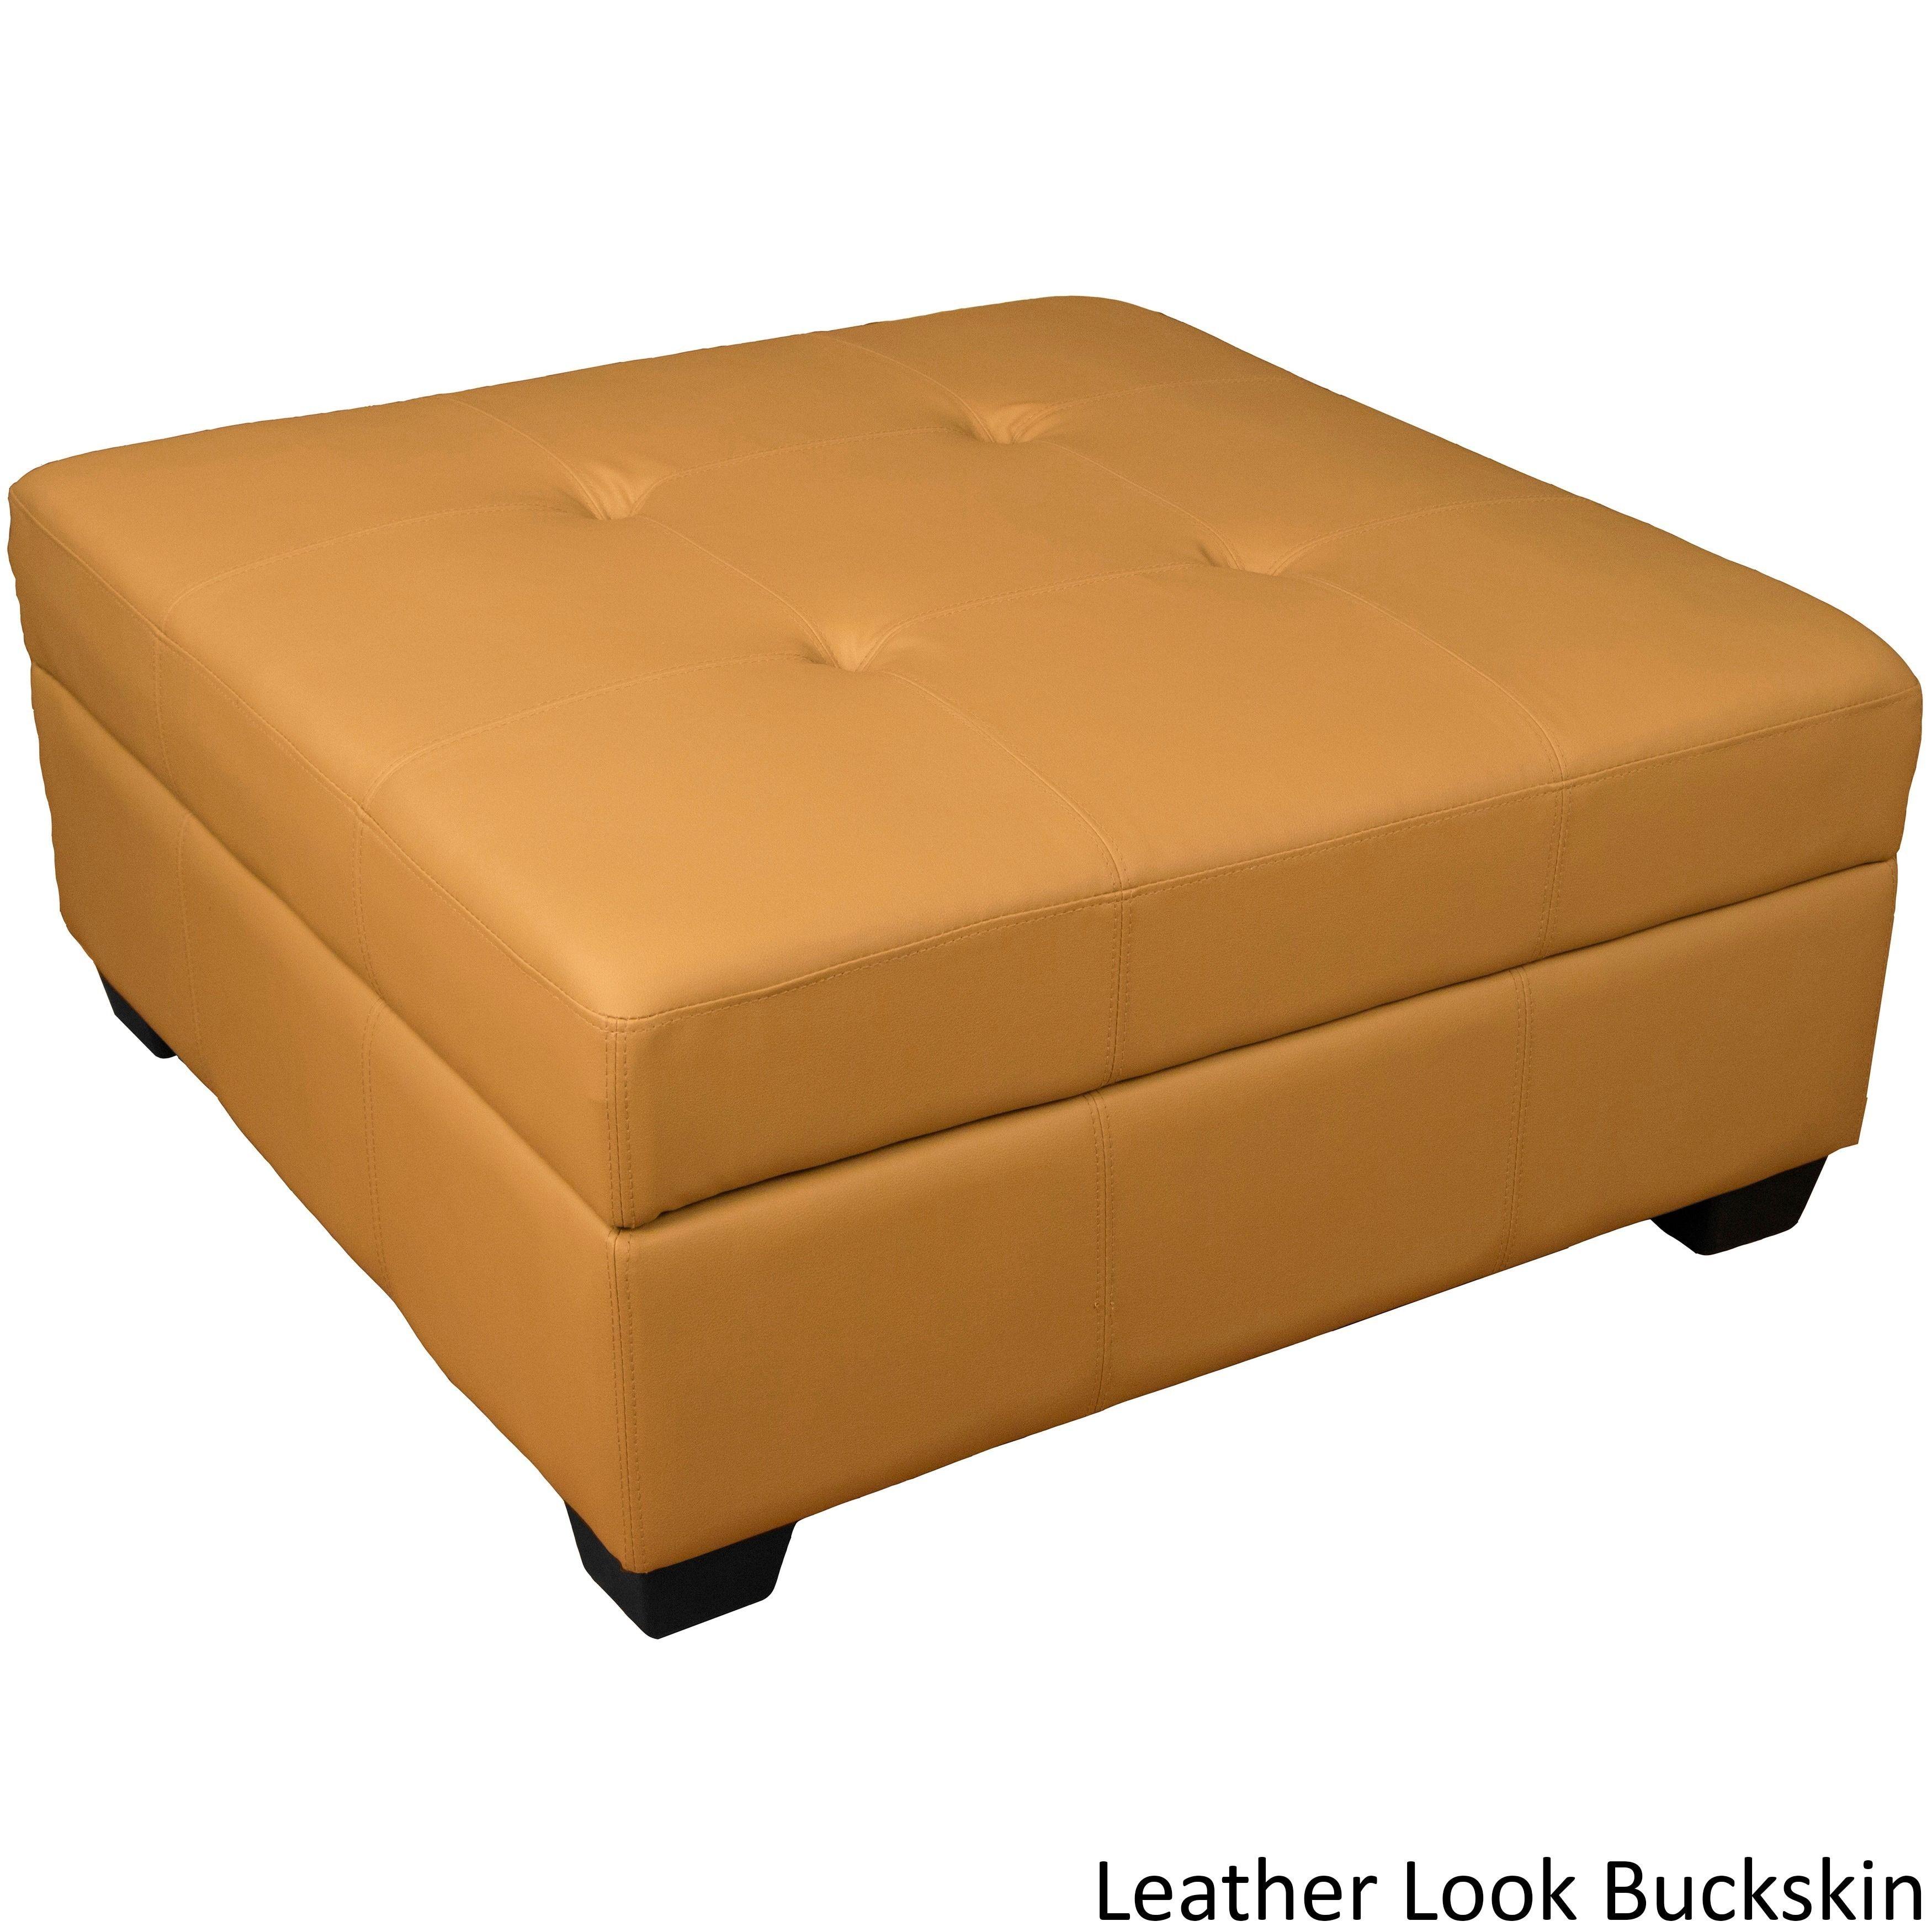 Epicfurnishings epic furnishings vanderbilt 36 inch square hinged storage bench ottoman leather look buckskin brown size large foam